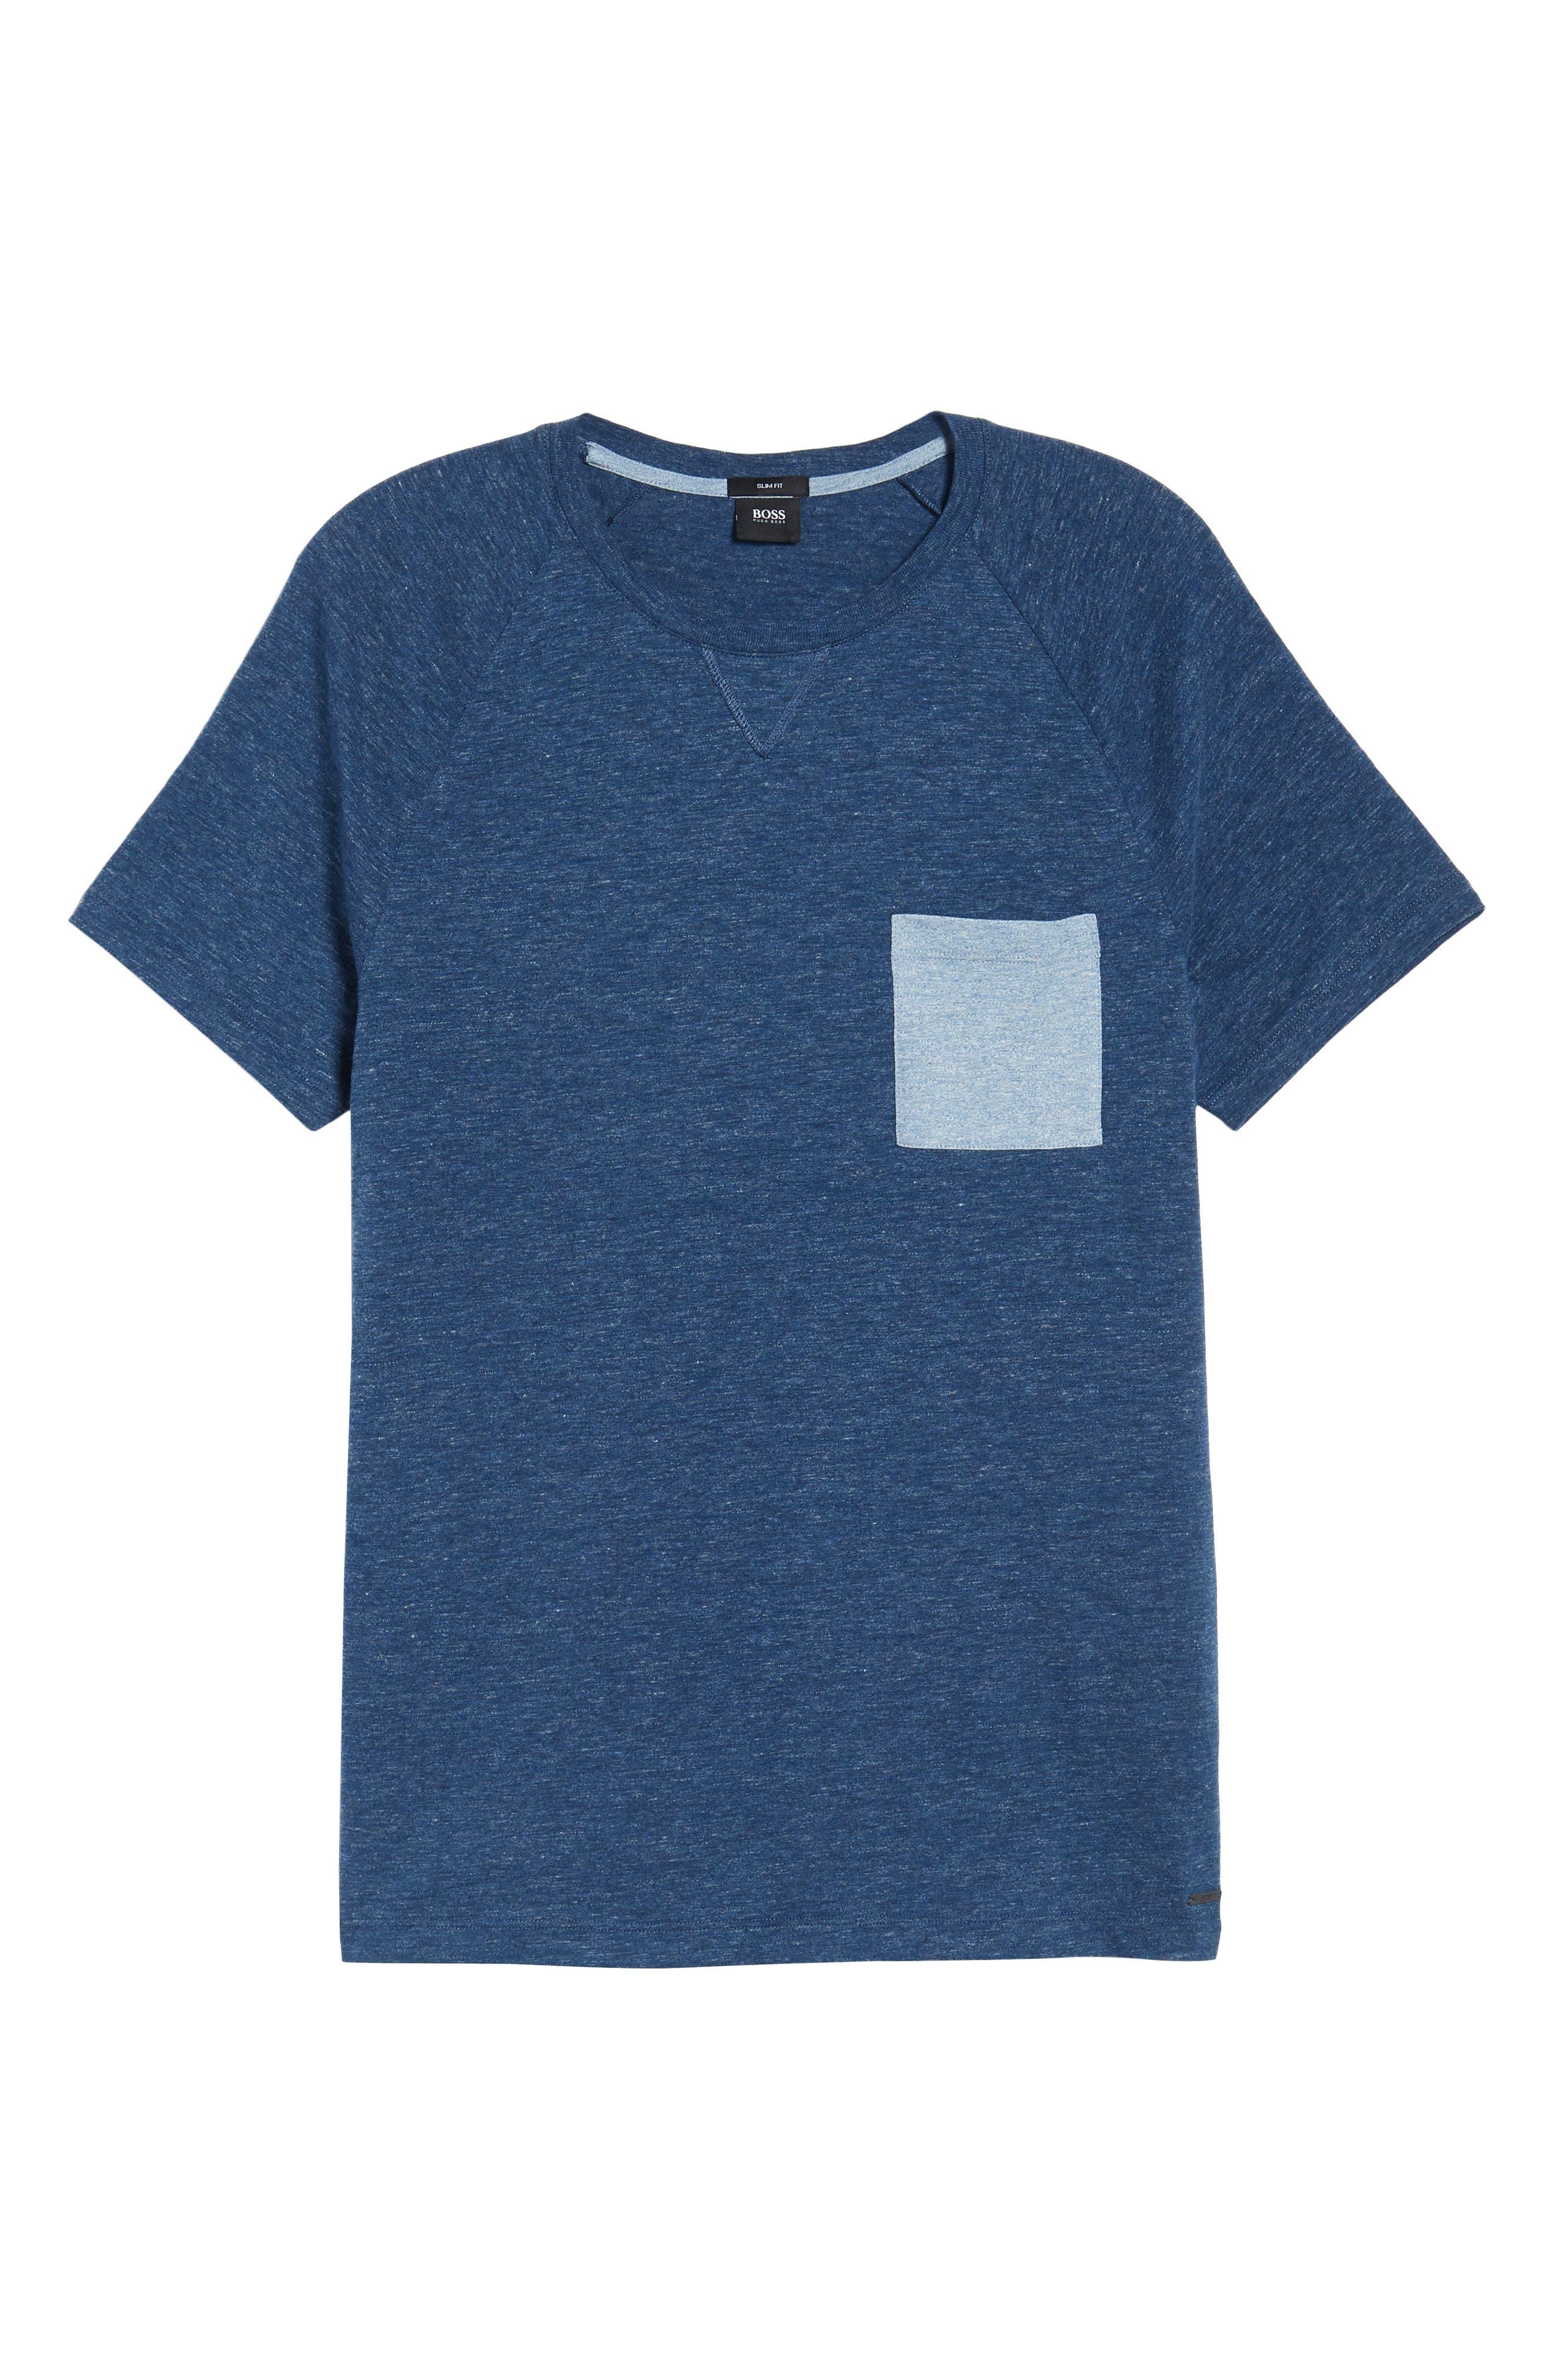 Tessler Slim Fit Pocket T-Shirt,                             Alternate thumbnail 6, color,                             Blue